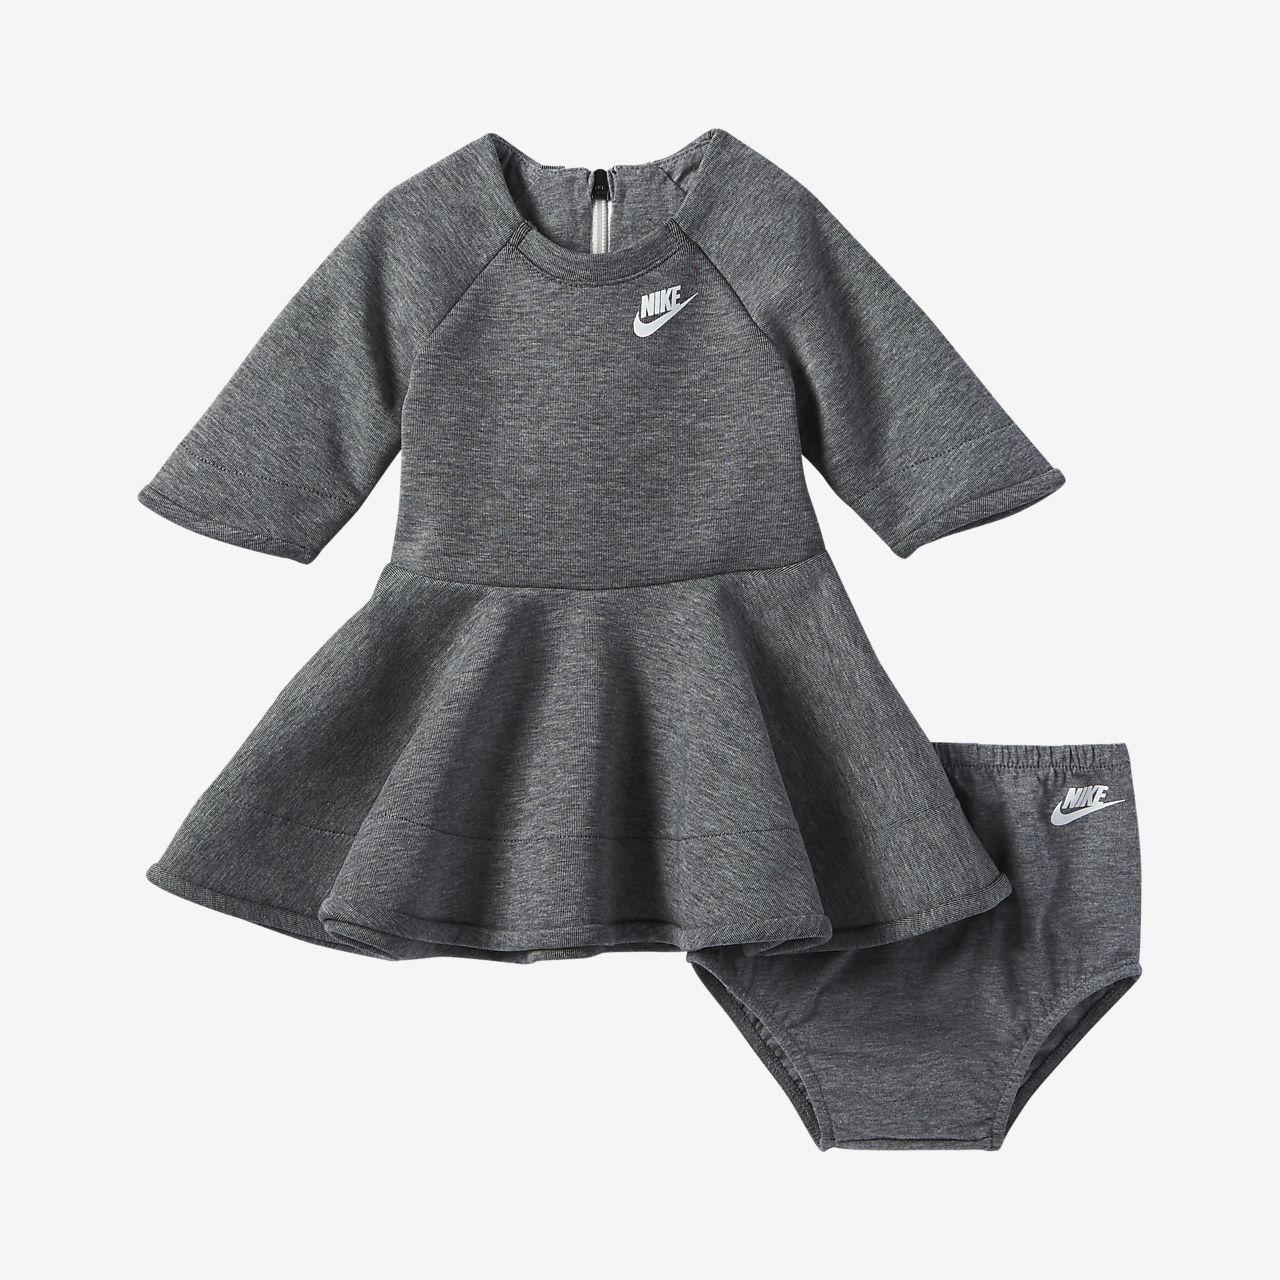 6ff658195f6 Φόρεμα Nike Tech Fleece για βρέφη. Nike.com GR